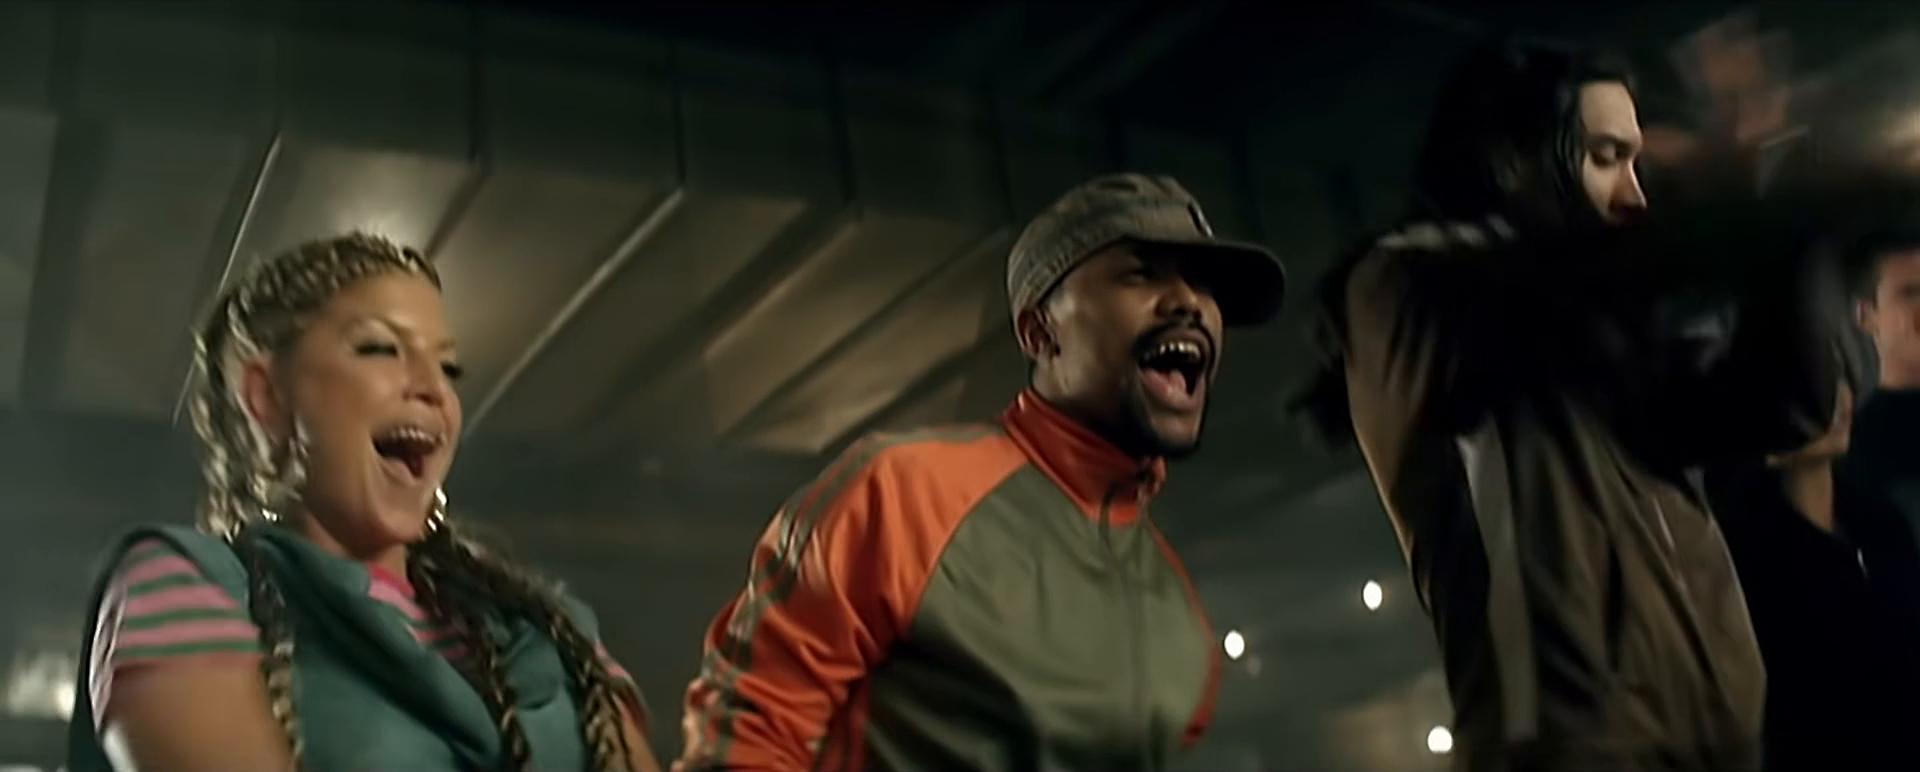 4The Black Eyed Peas - Pump It.(2006).WEB-DLRip 1080p.60fps.[-=DoMiNo=-].png